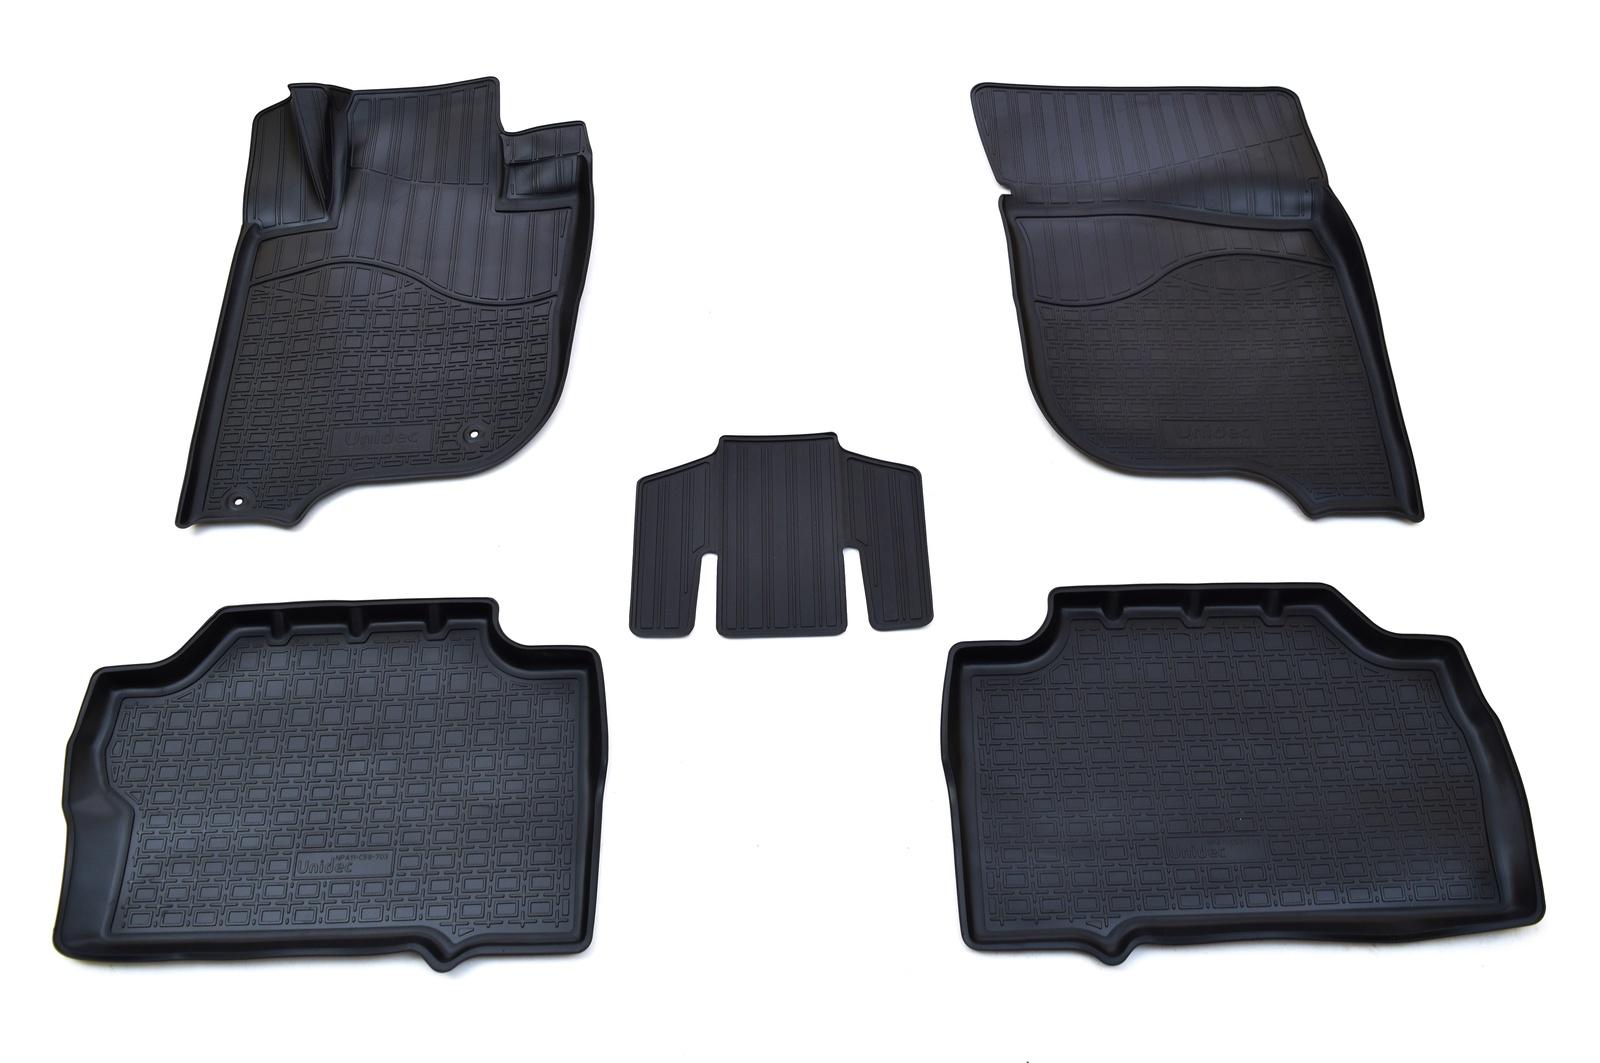 Коврики в салон автомобиля Norplast для Mitsubishi Pajero Sport III 3D (2015) (5шт), NPA11-C59-703, черный коврики в салон mitsubishi pajero sport i 1998 2008 внед 5 шт текстиль